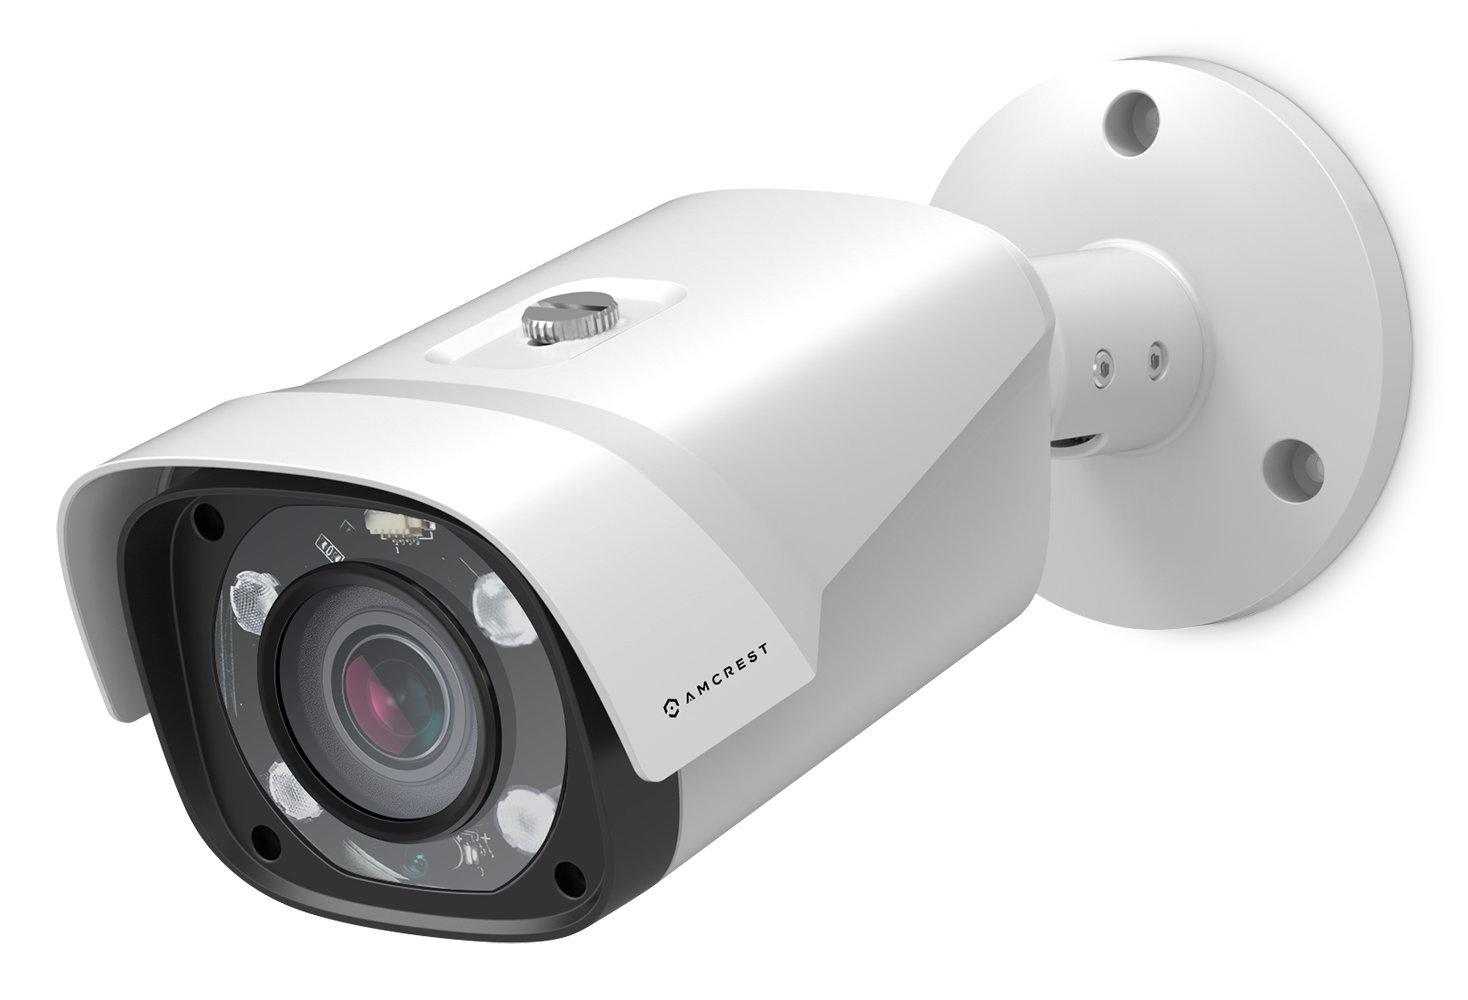 Amcrest UltraHD 4MP POE Bullet IP Security Camera, 2688x1520, 197ft NightVision, MicroSD Storage, Motorized Varifocal Lens 55°-104°, 5x Optical Zoom, White (IP4M-1054EW)